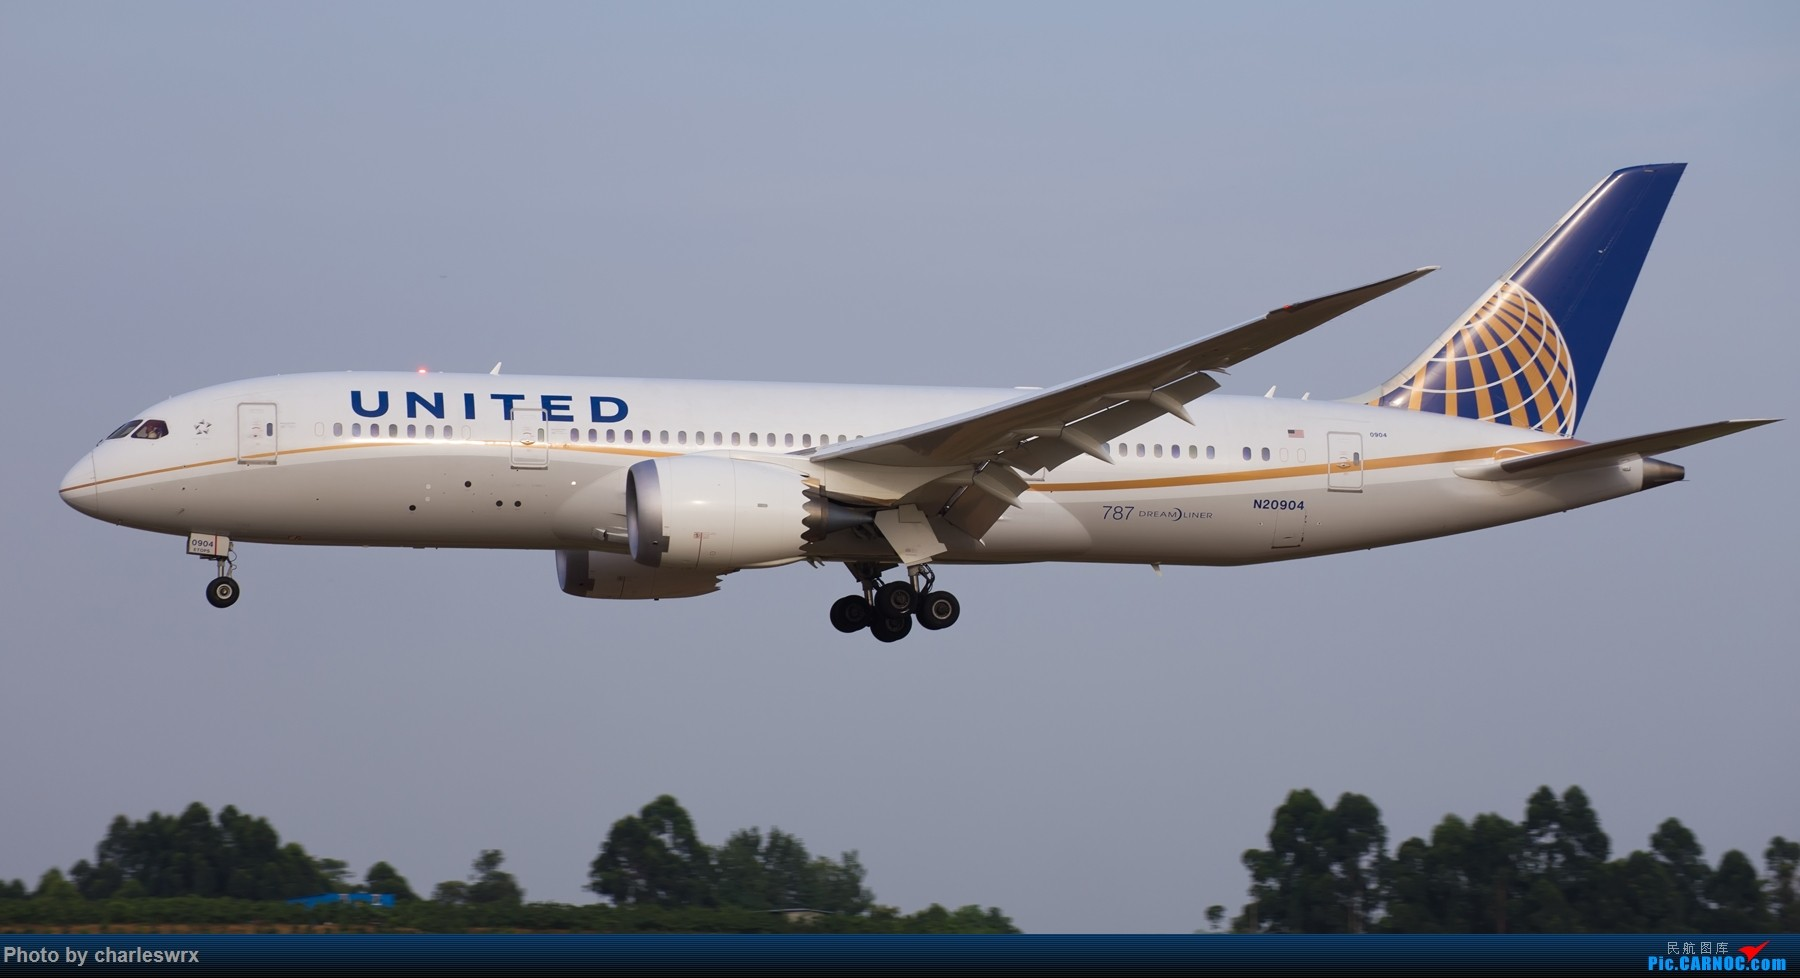 Re:[原创]夕阳余晖下的CTU BOEING 787-8 N-20904 中国成都双流国际机场